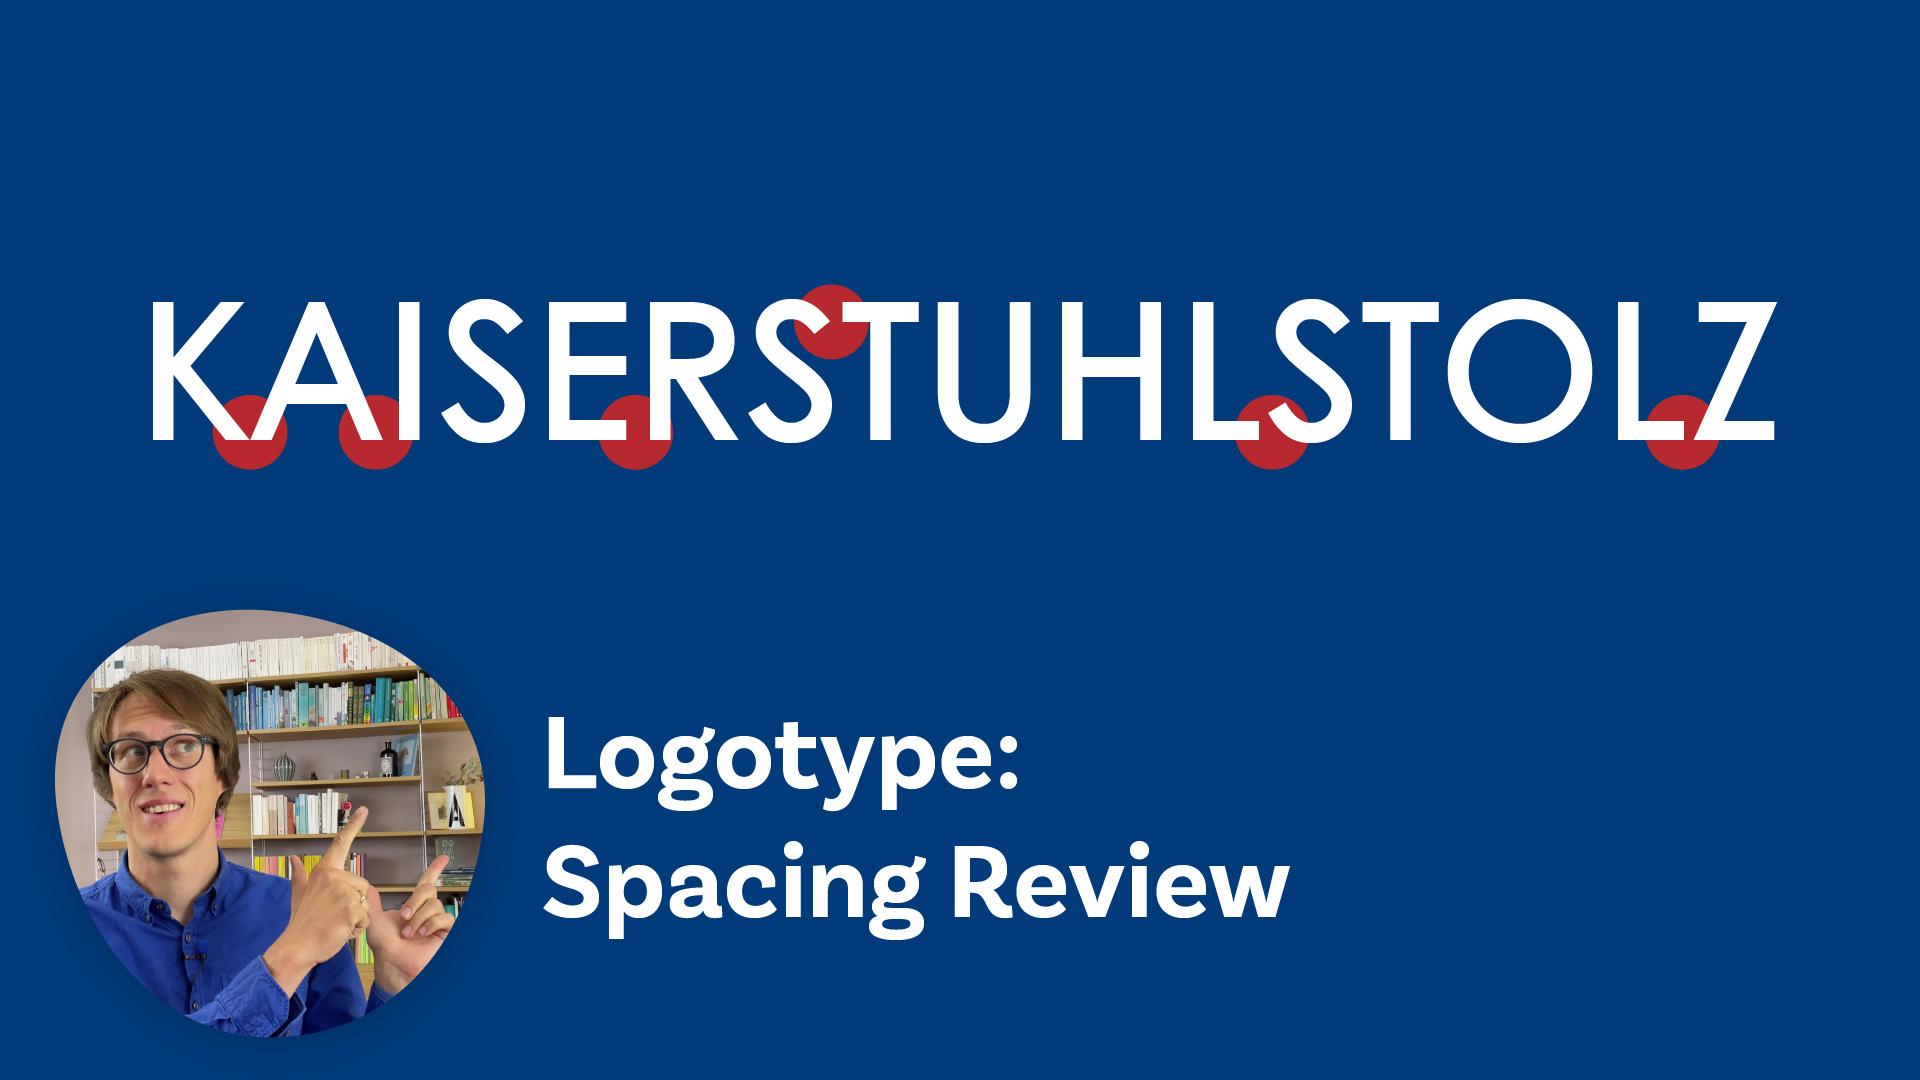 Logotype: spacing review